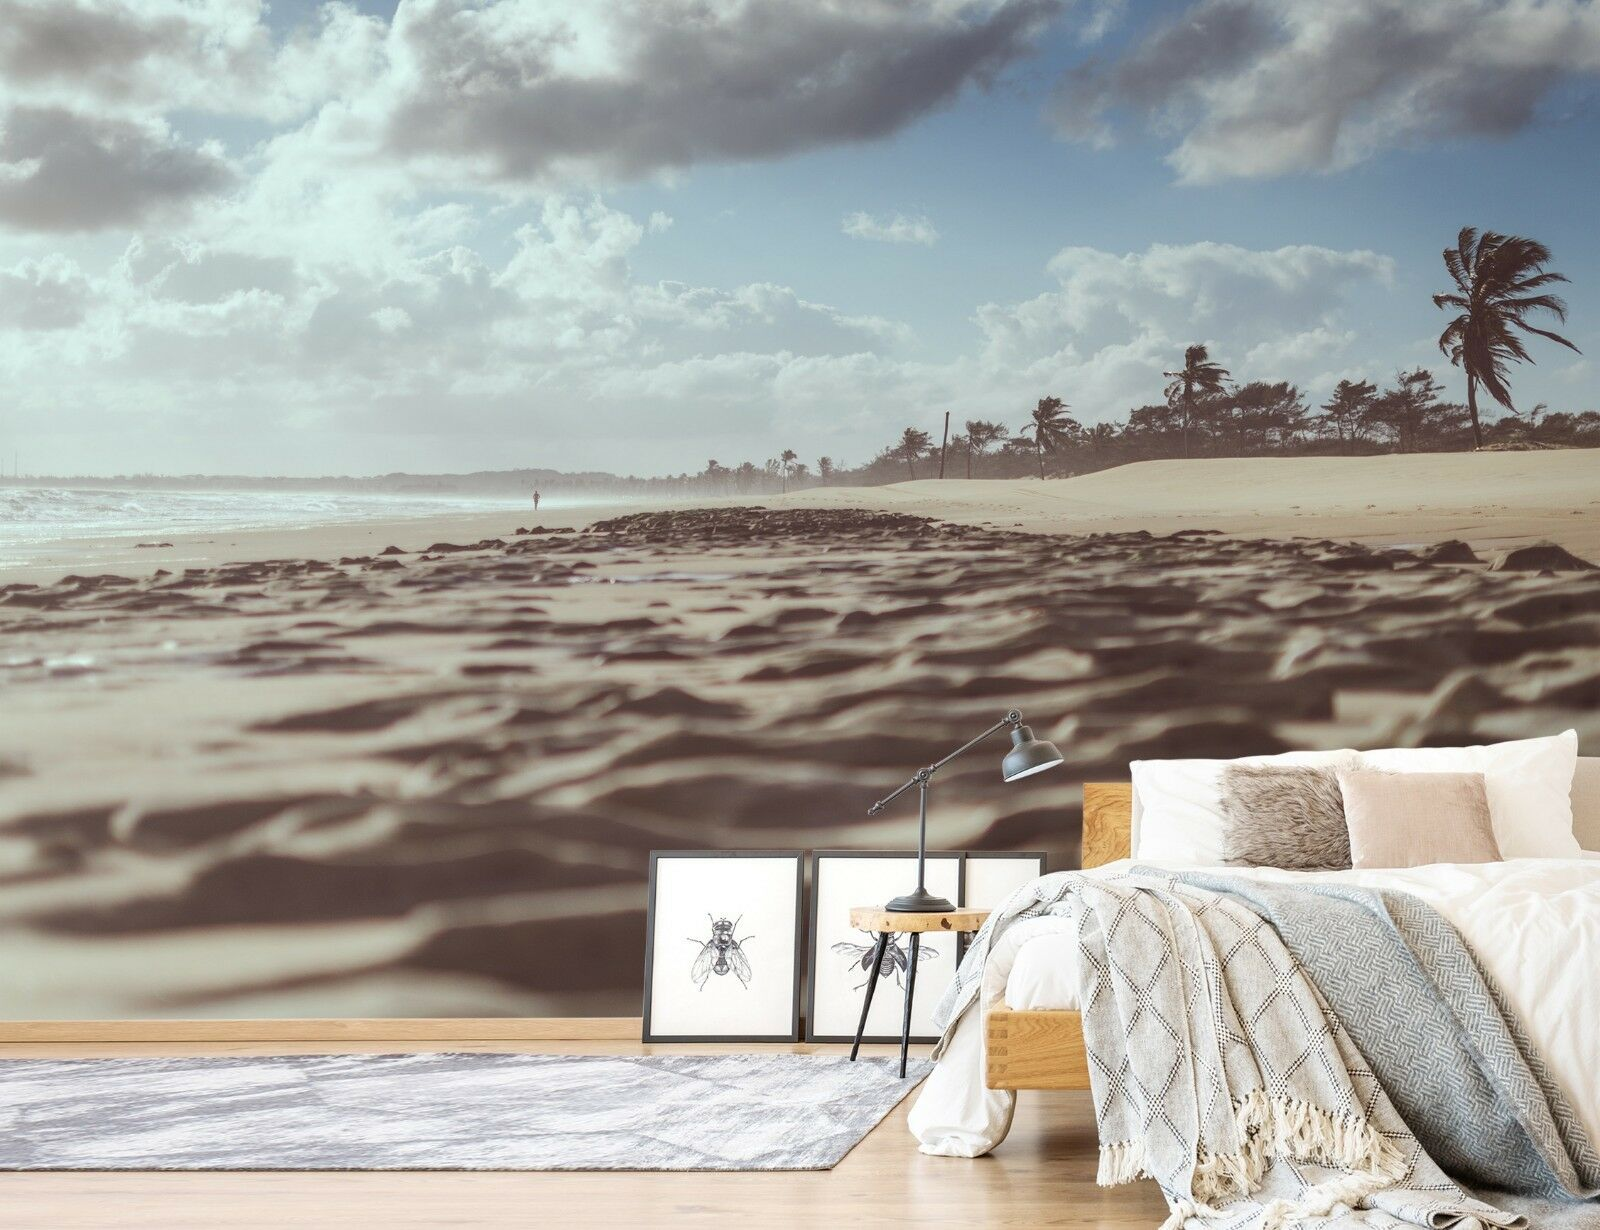 3D Beach Coco 7086 Wallpaper Mural Paper Wall Print Indoor Murals CA Summer